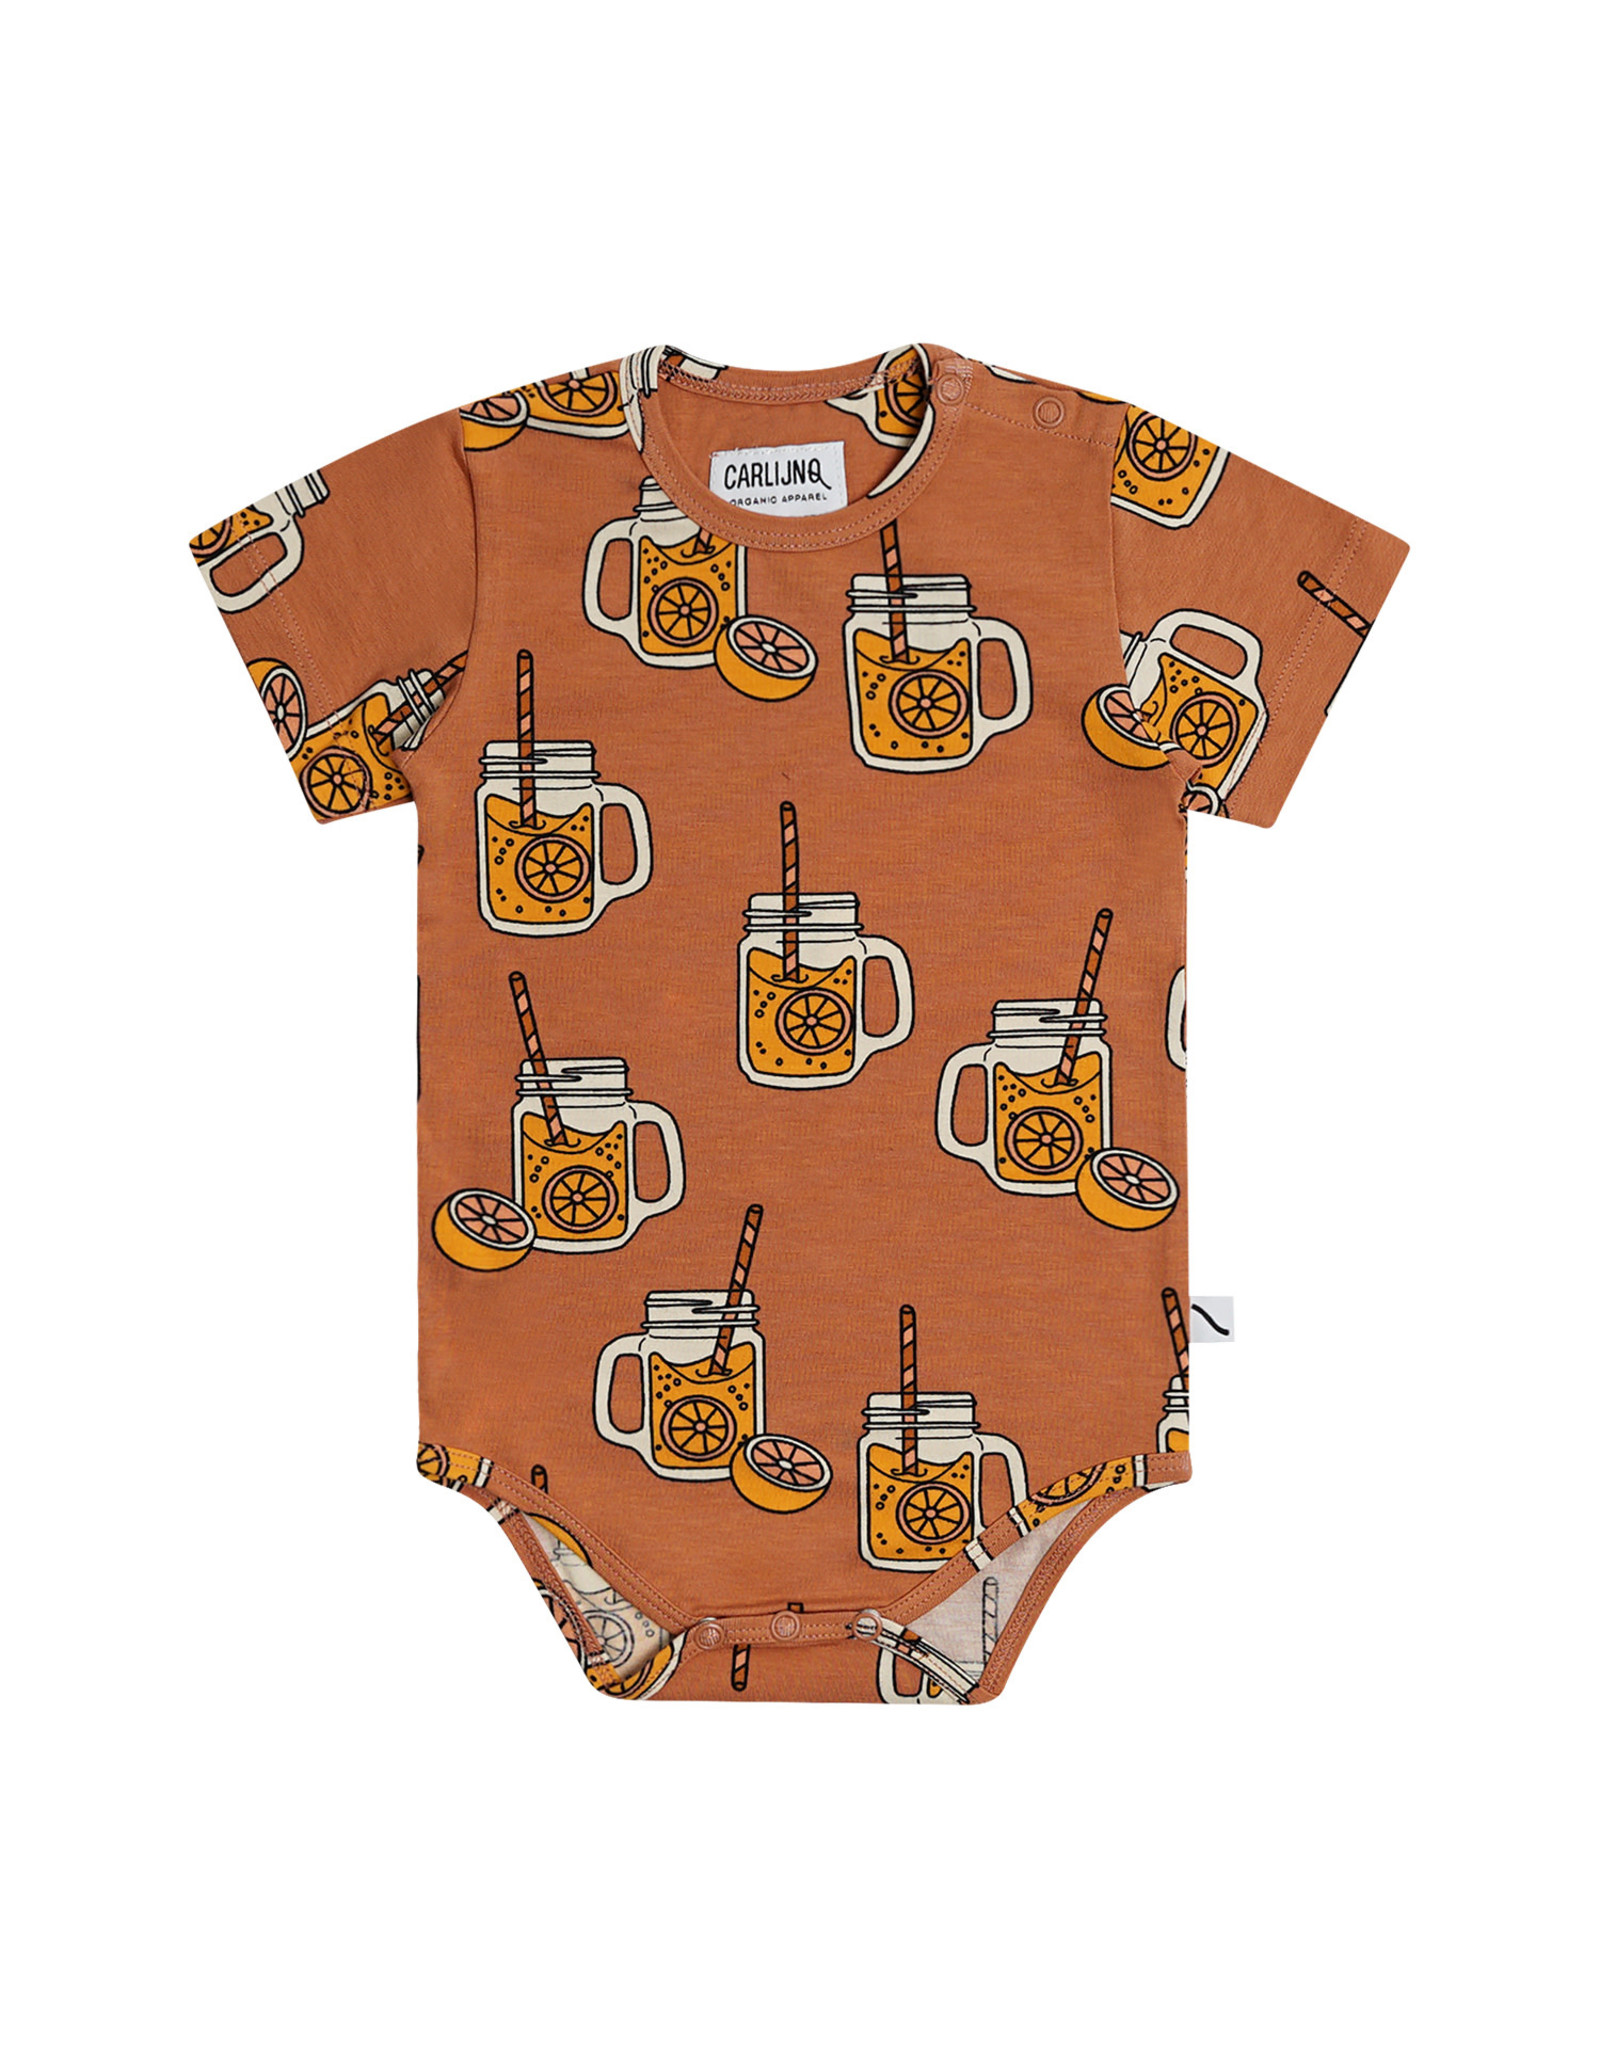 Carlijn Q Carlijn Q lemonade - Bodysuit Short Sleeve